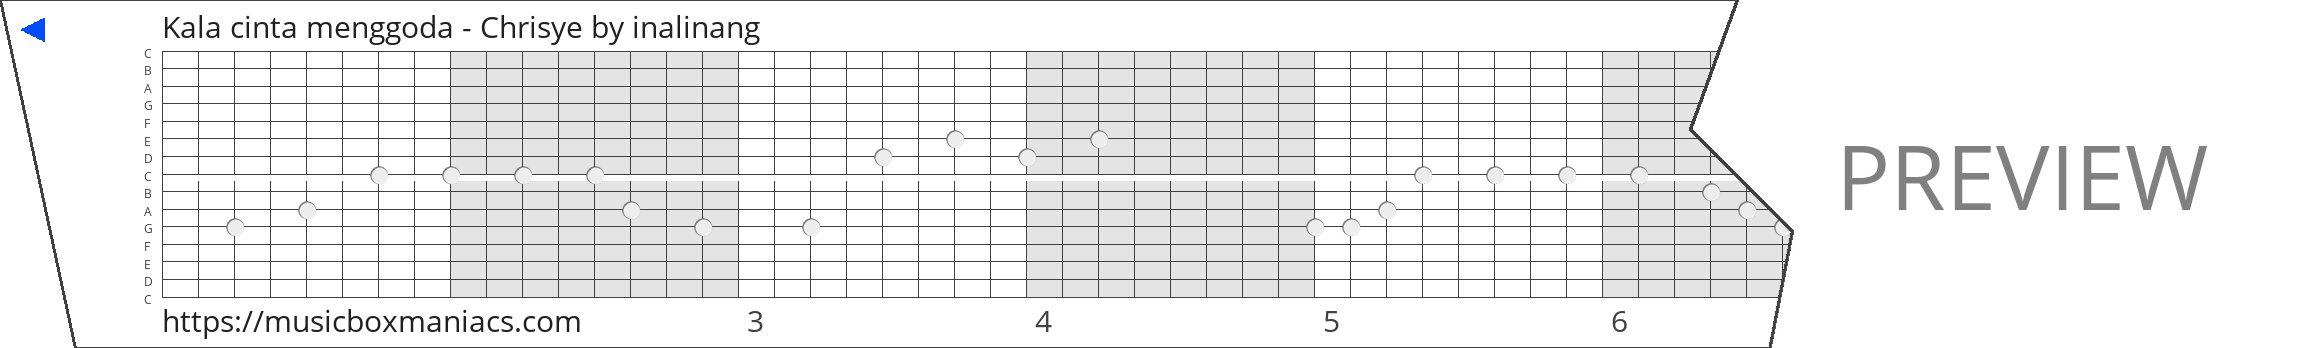 Kala cinta menggoda - Chrisye 15 note music box paper strip